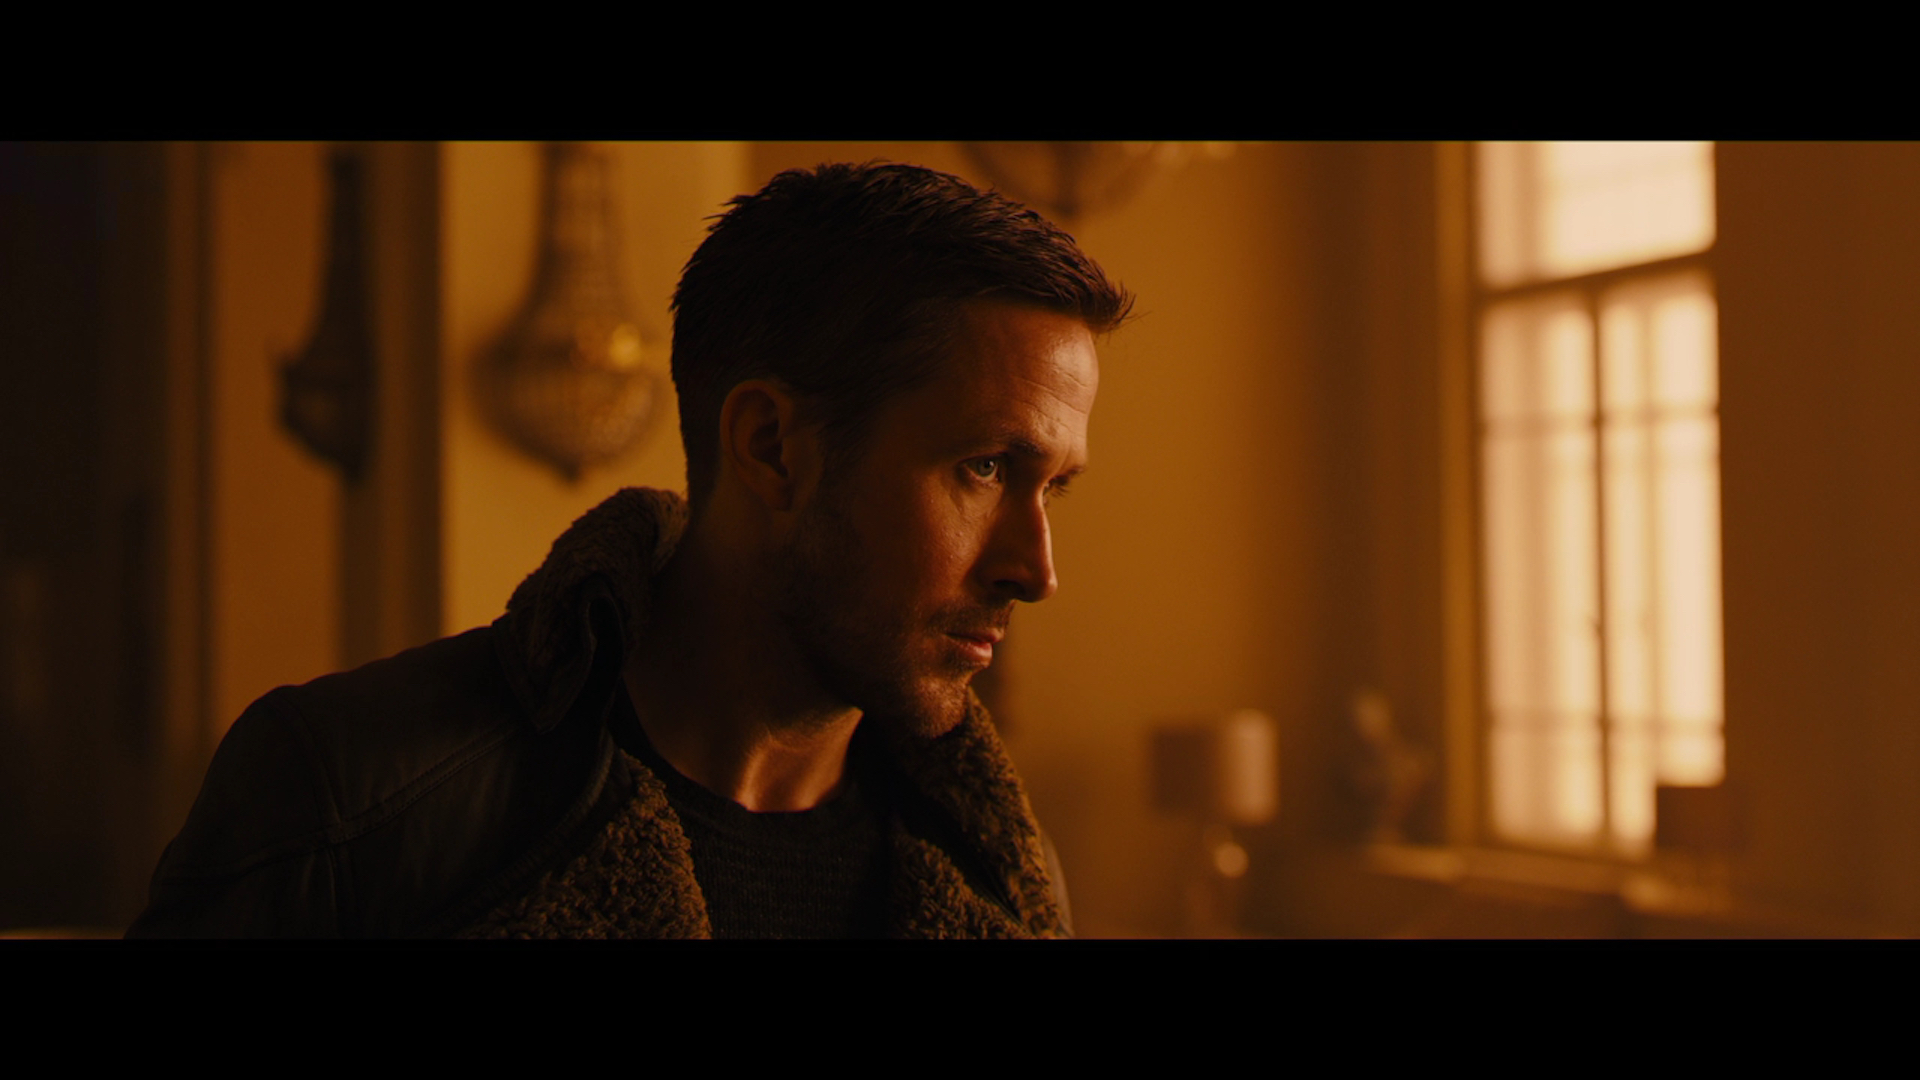 Blade Runner 2049 Wallpapers From Trailer 1920x1080: Blade Runner 2049 Wallpapers (29 Wallpapers)